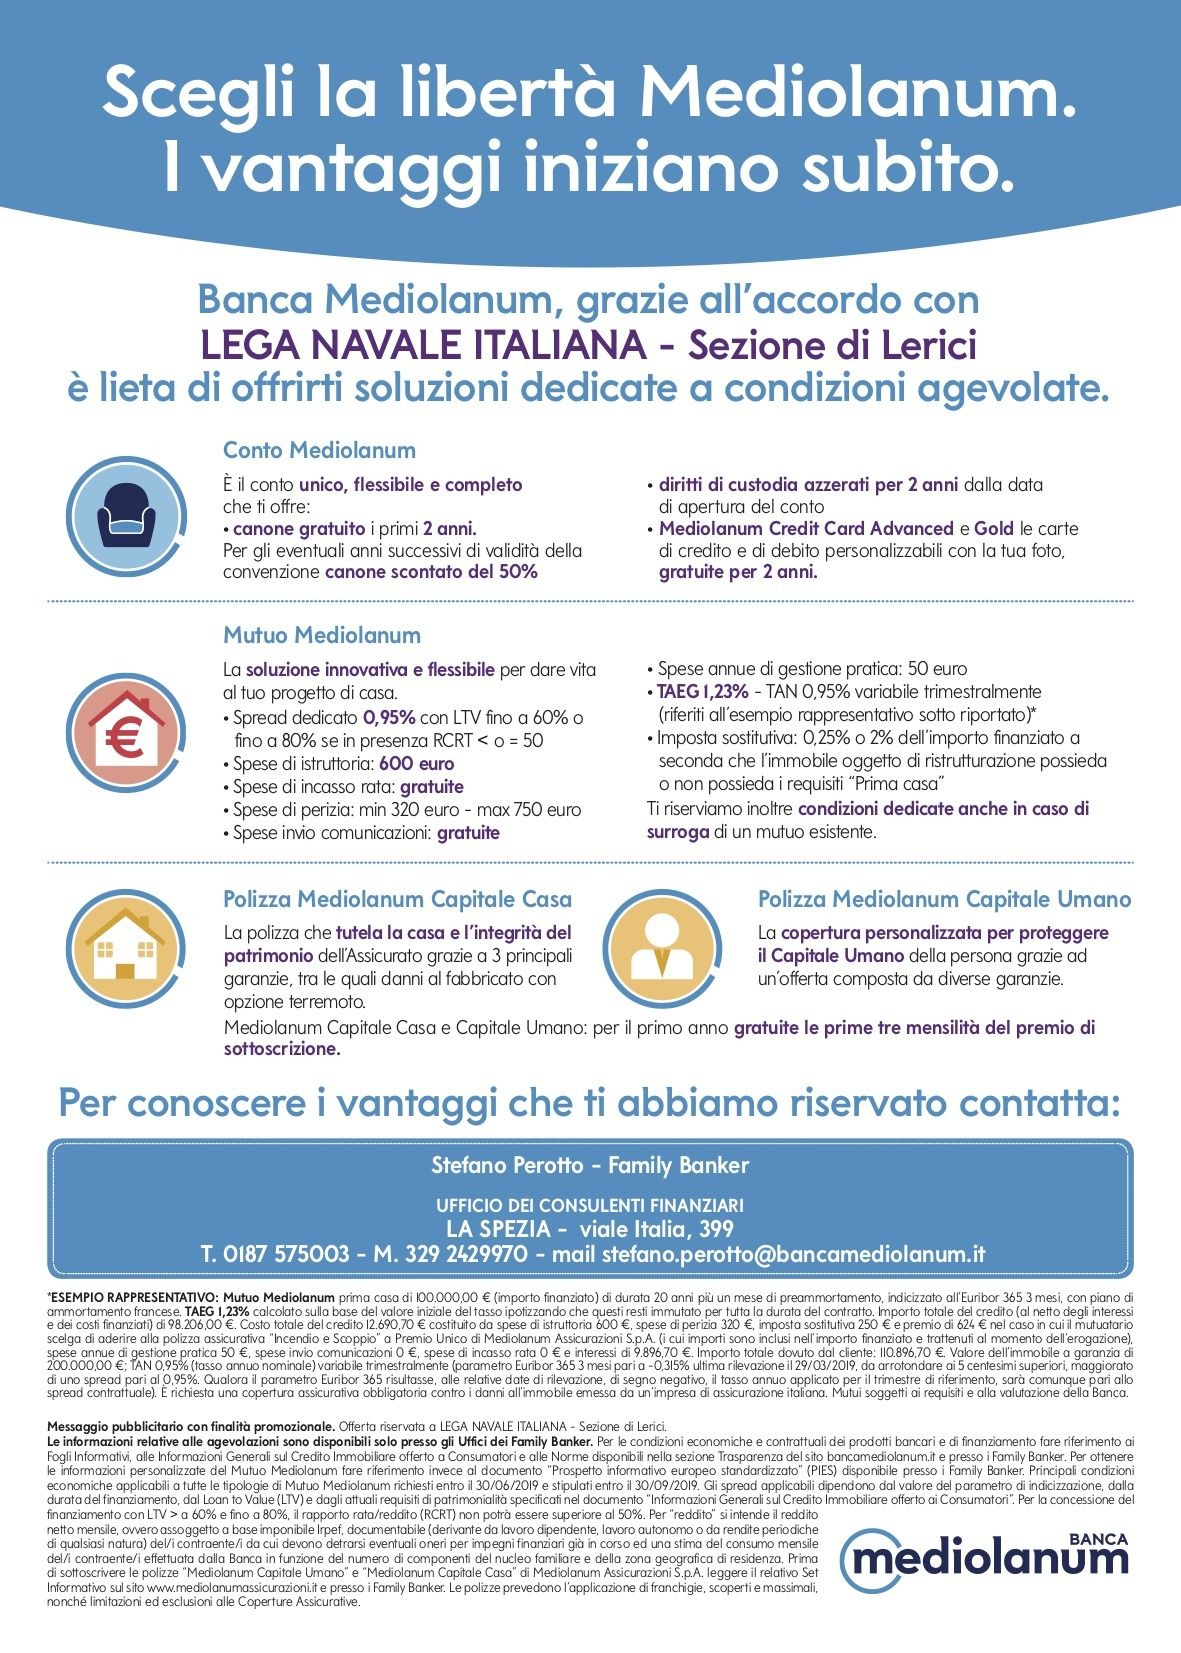 Flyer_Offerta_TOP_LegaNavaleItaliana_Stefano_Perotto_MASTERAPR2019.jpg